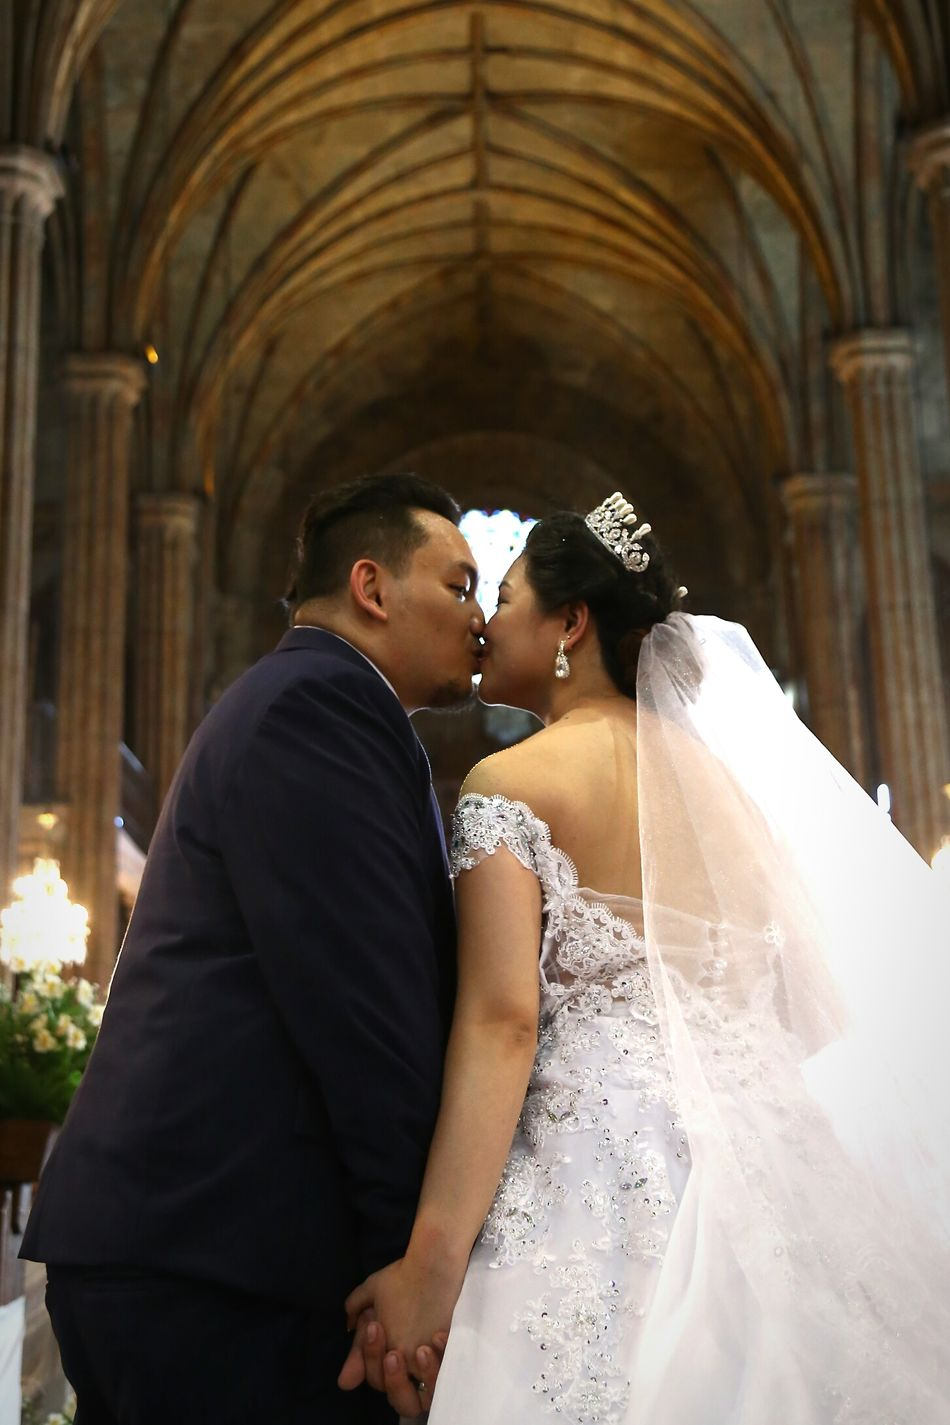 Wedding Photography Love ♥ Justmarried💑 Bride Groom Kiss Church